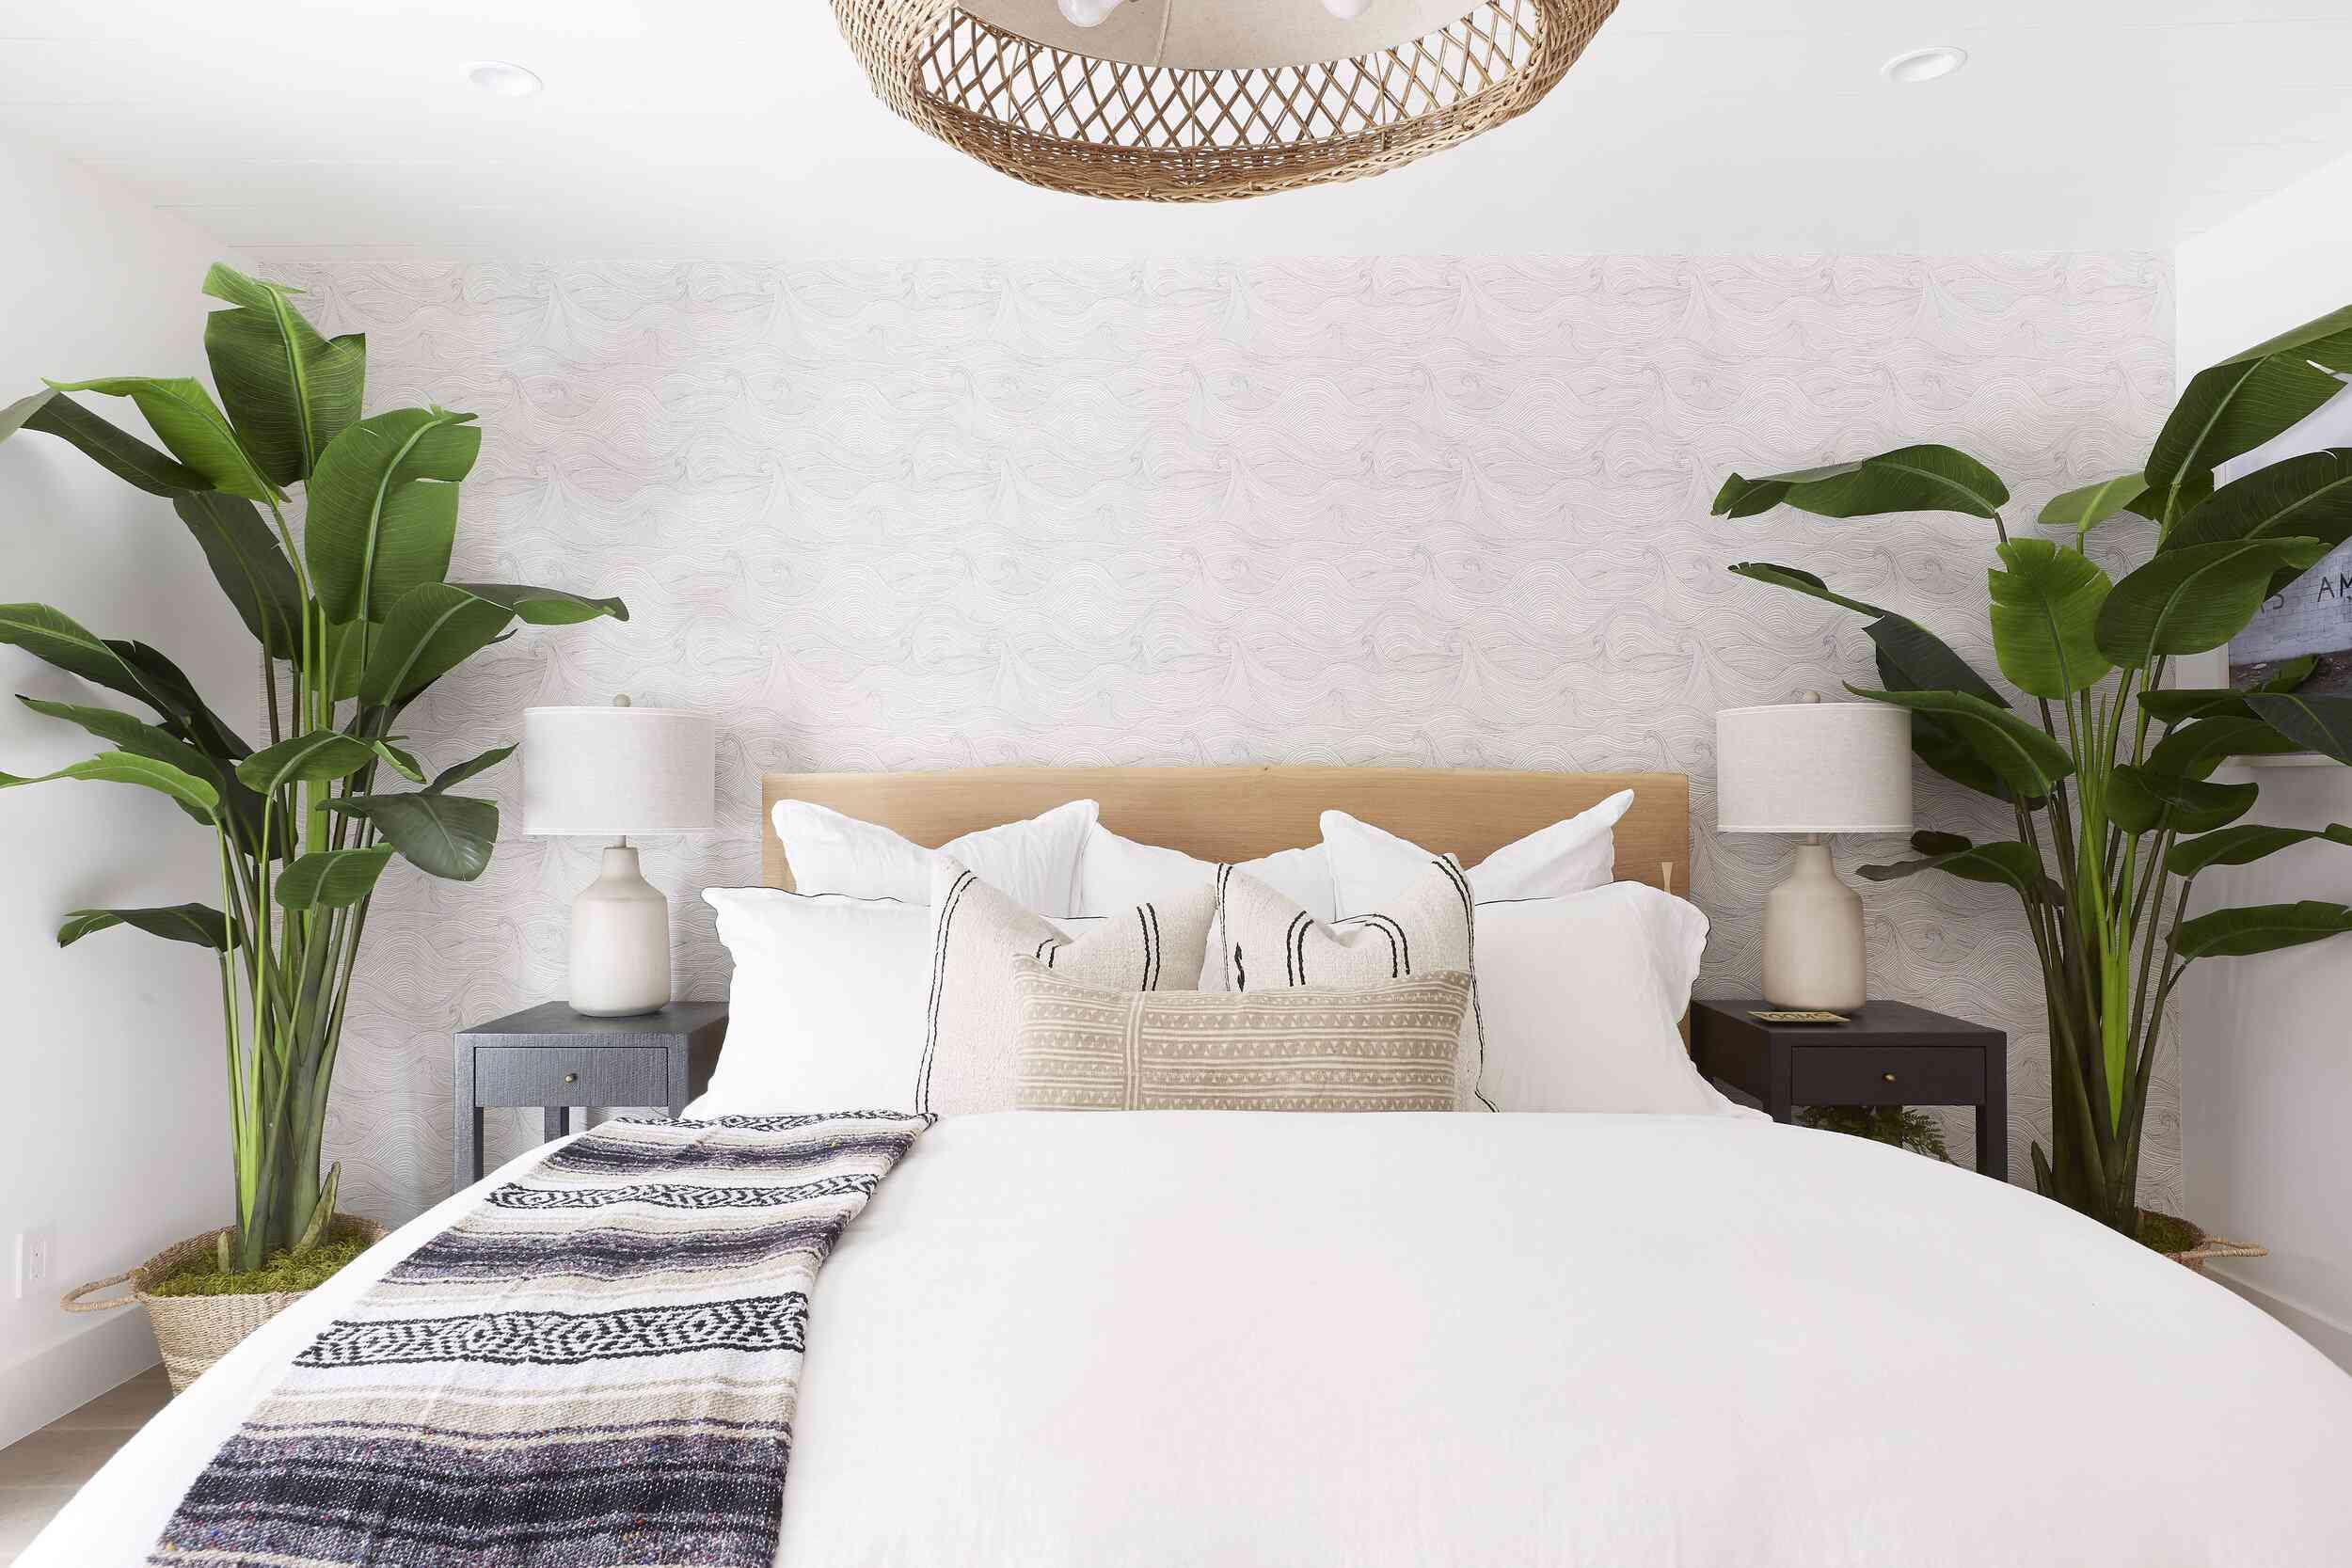 Light beige wallpaper behind coastal bed.